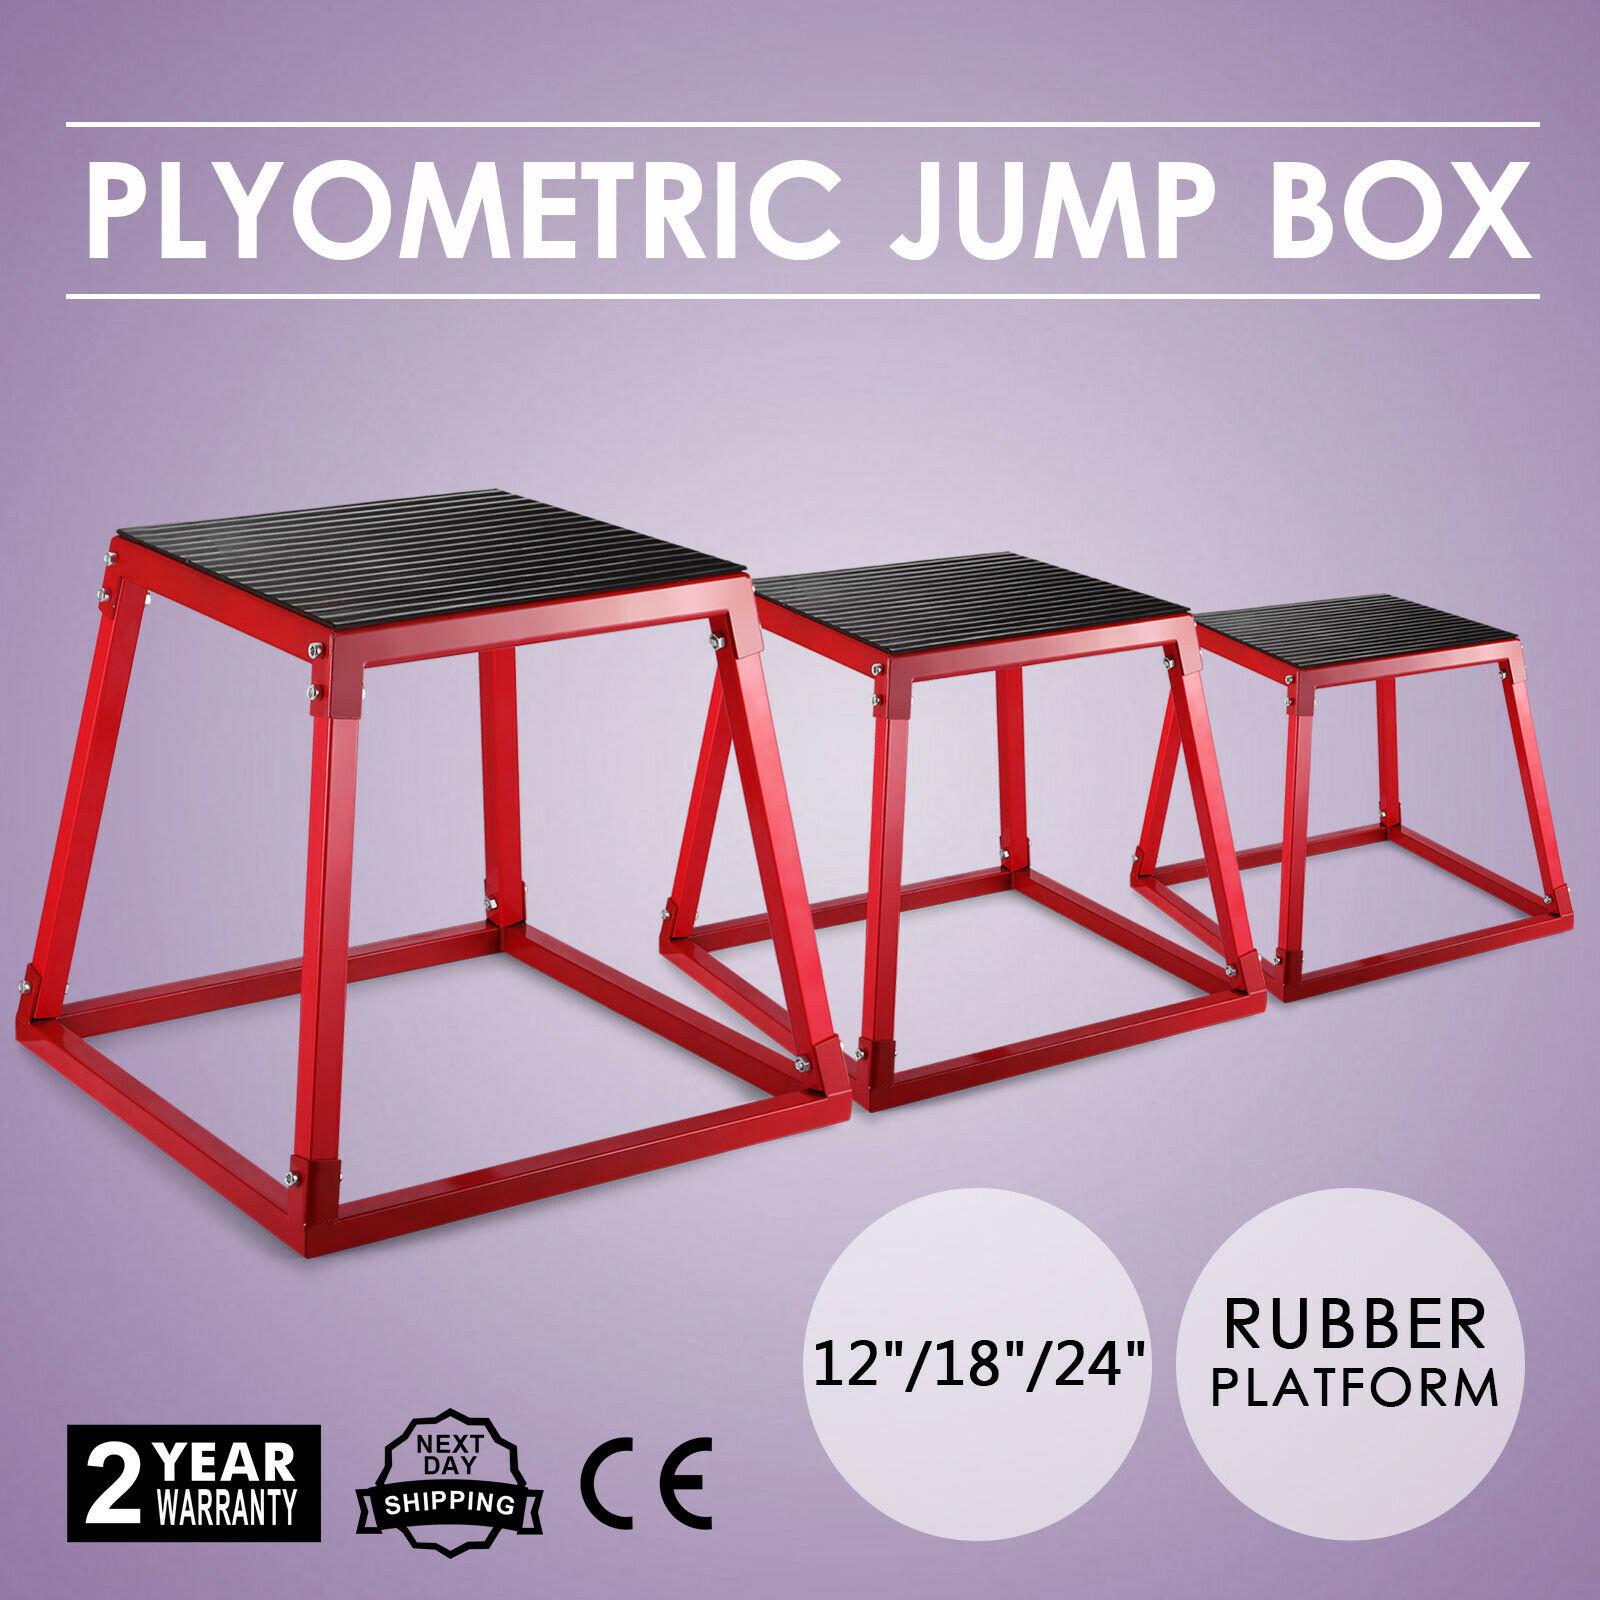 VEVOR, cajas plyométricas de 12 pulgadas, 18 pulgadas, 24 pulgadas, plataforma plyométrica, caja salto, ejercicio